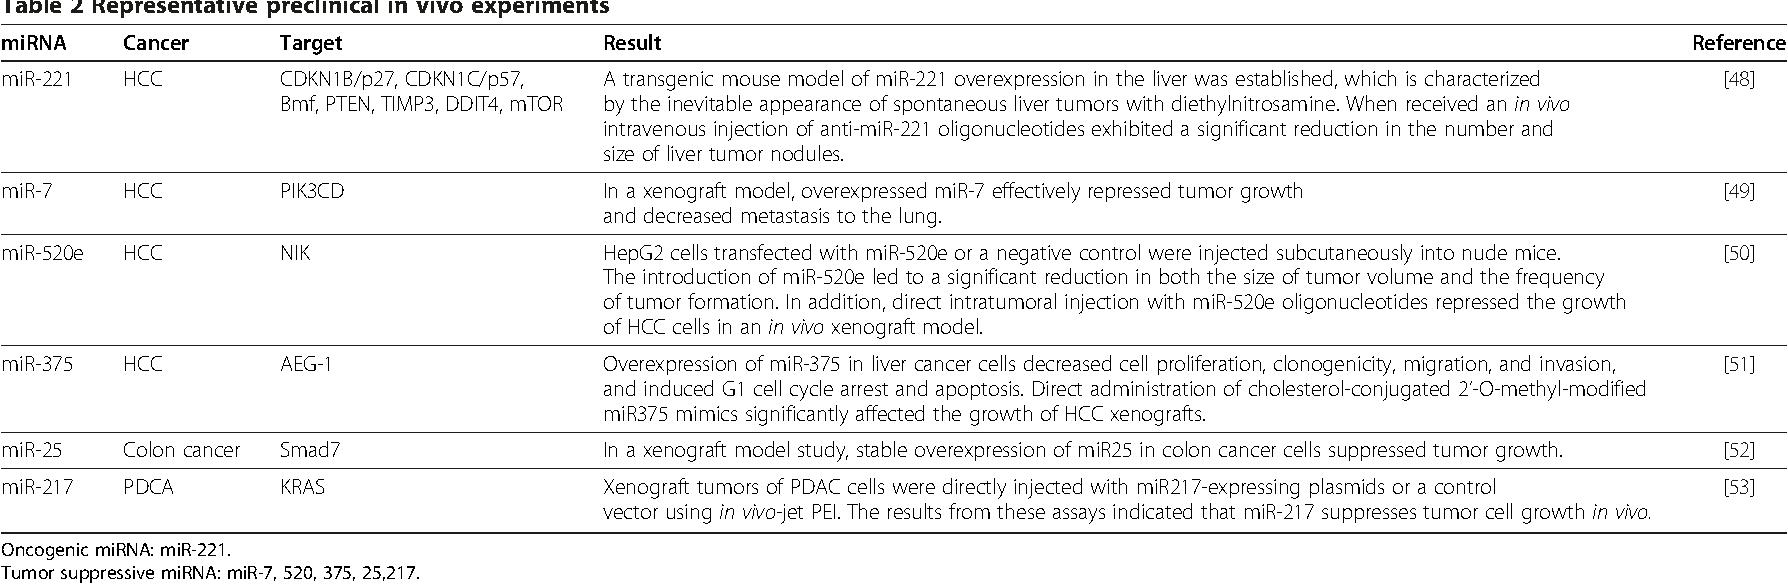 Table 2 Representative preclinical in vivo experiments